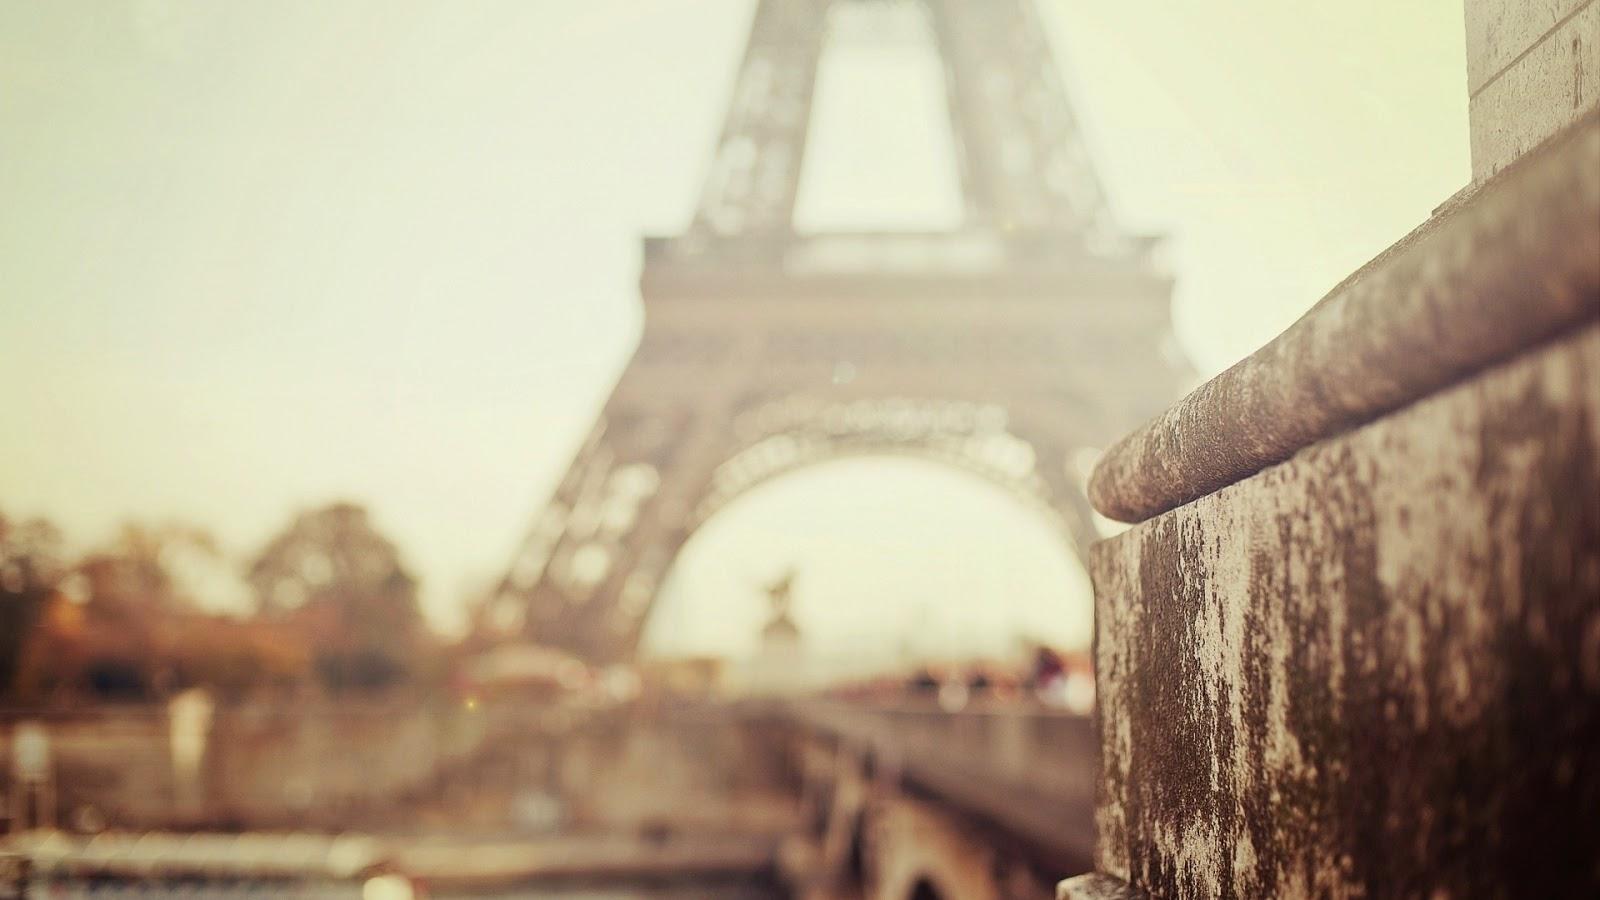 Most Inspiring Wallpaper Mac Paris - eiffel-tower-paris-hd-wallpaper  Snapshot_846048.jpg